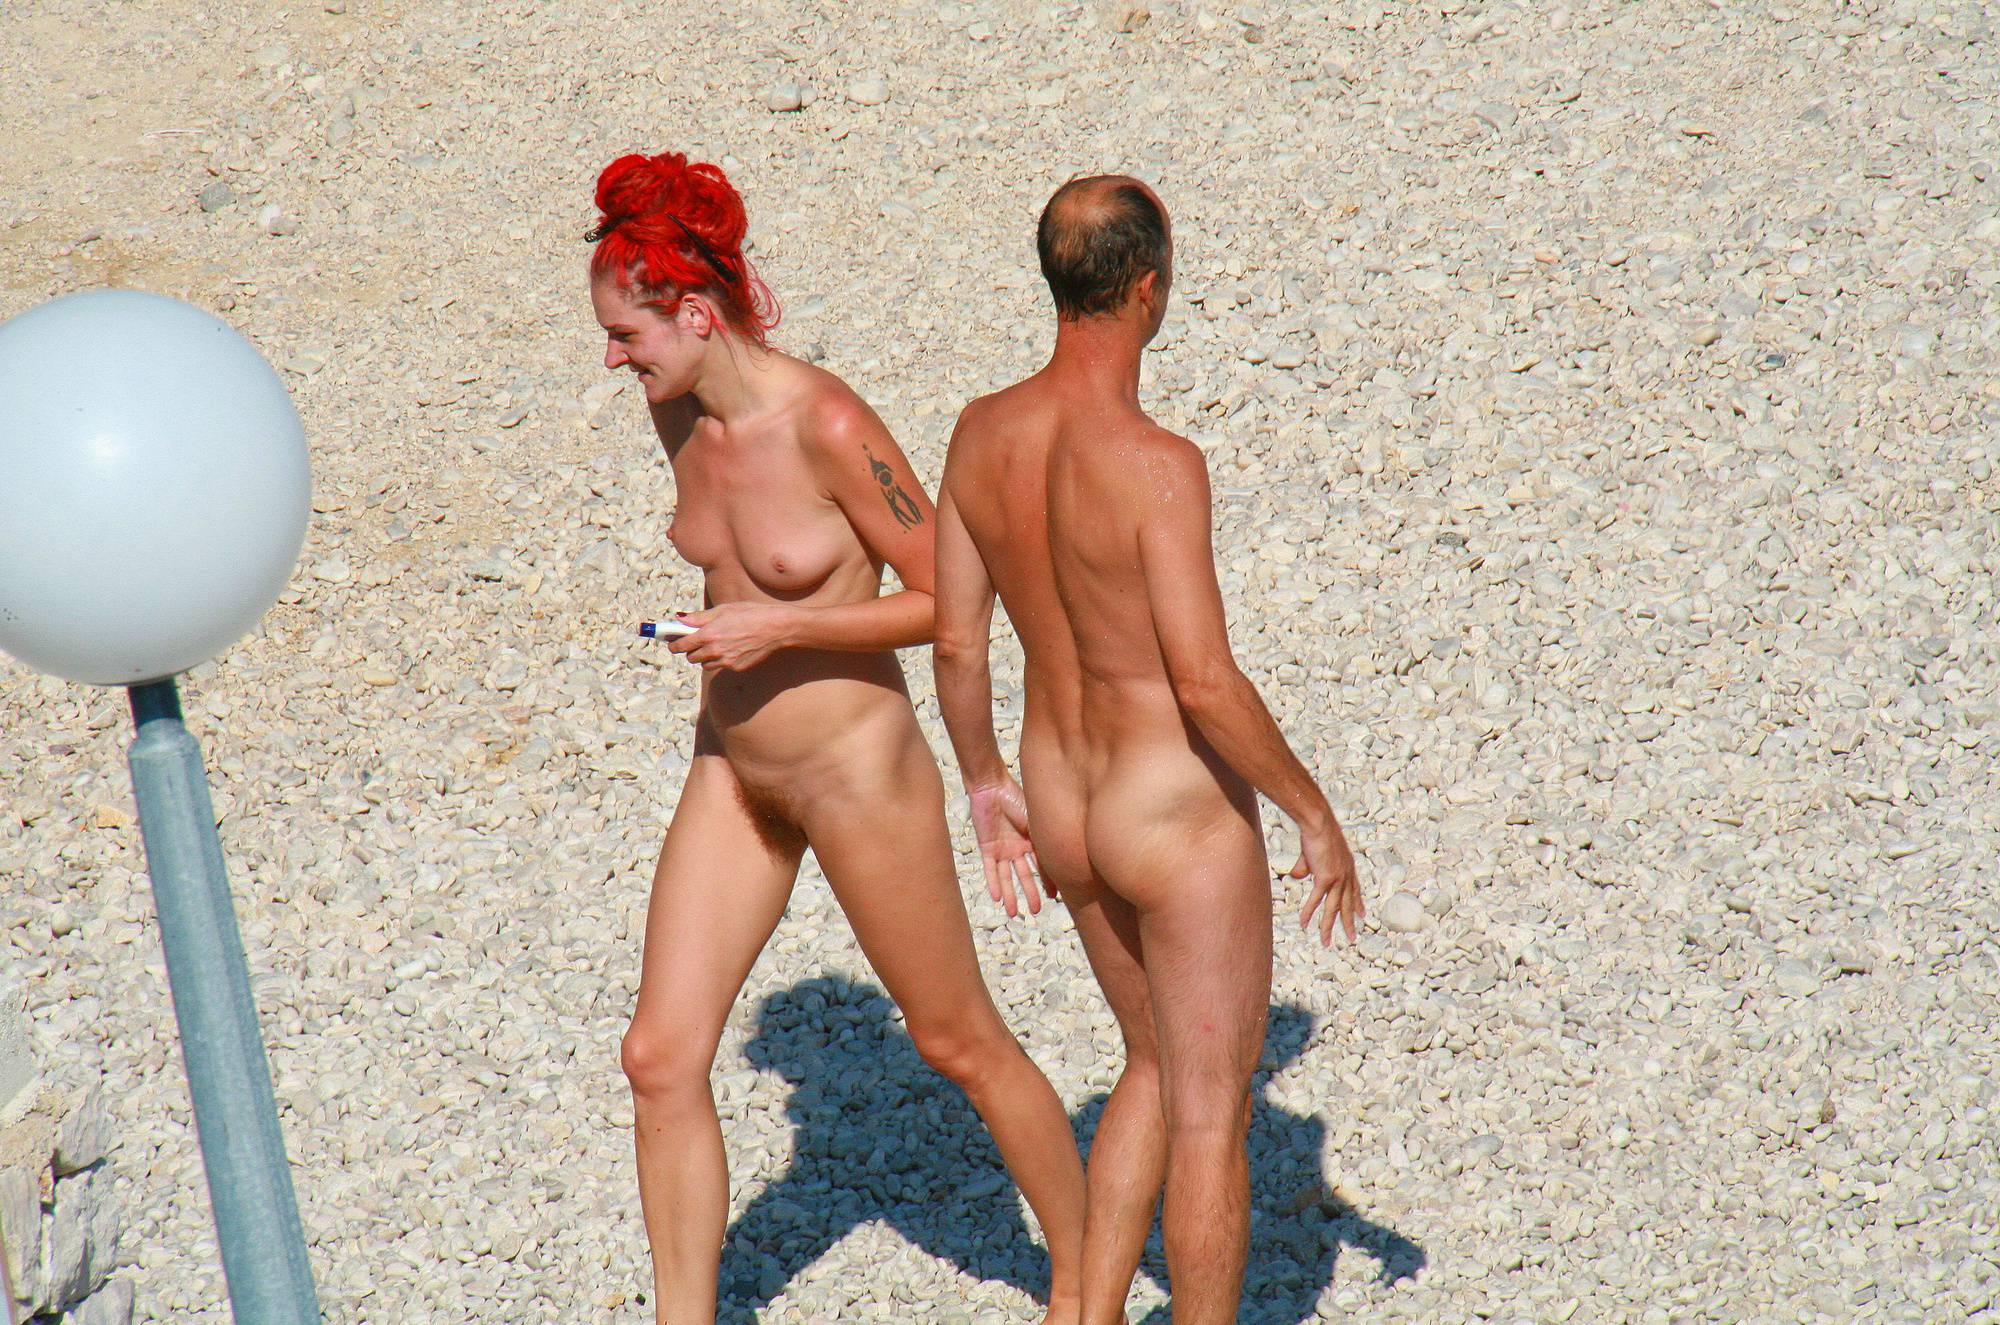 Nudist Gallery Ula FKK Red Hairstyle Girl - 2